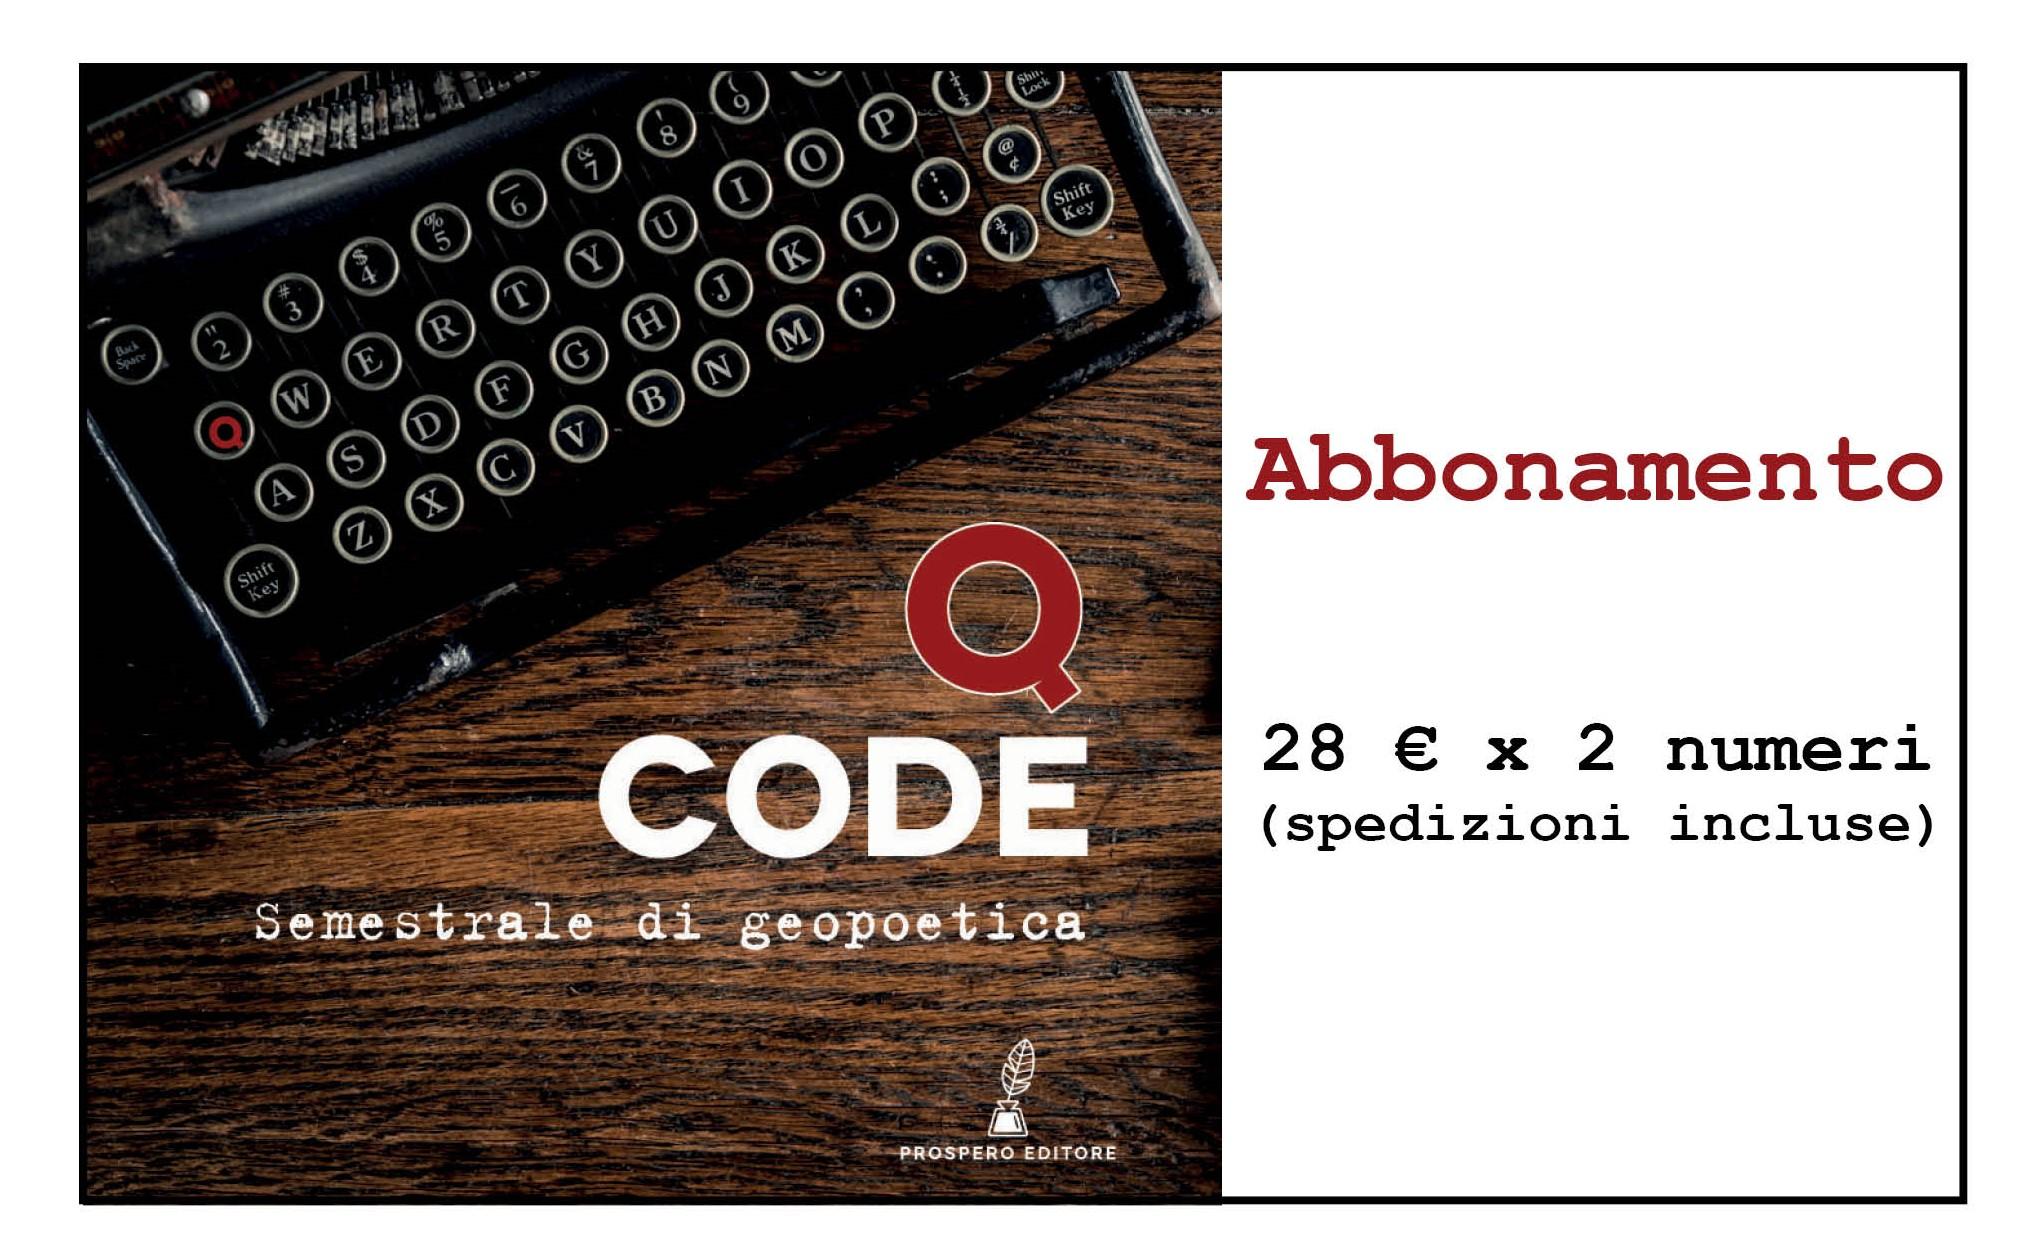 Abbonamento Q Code-image